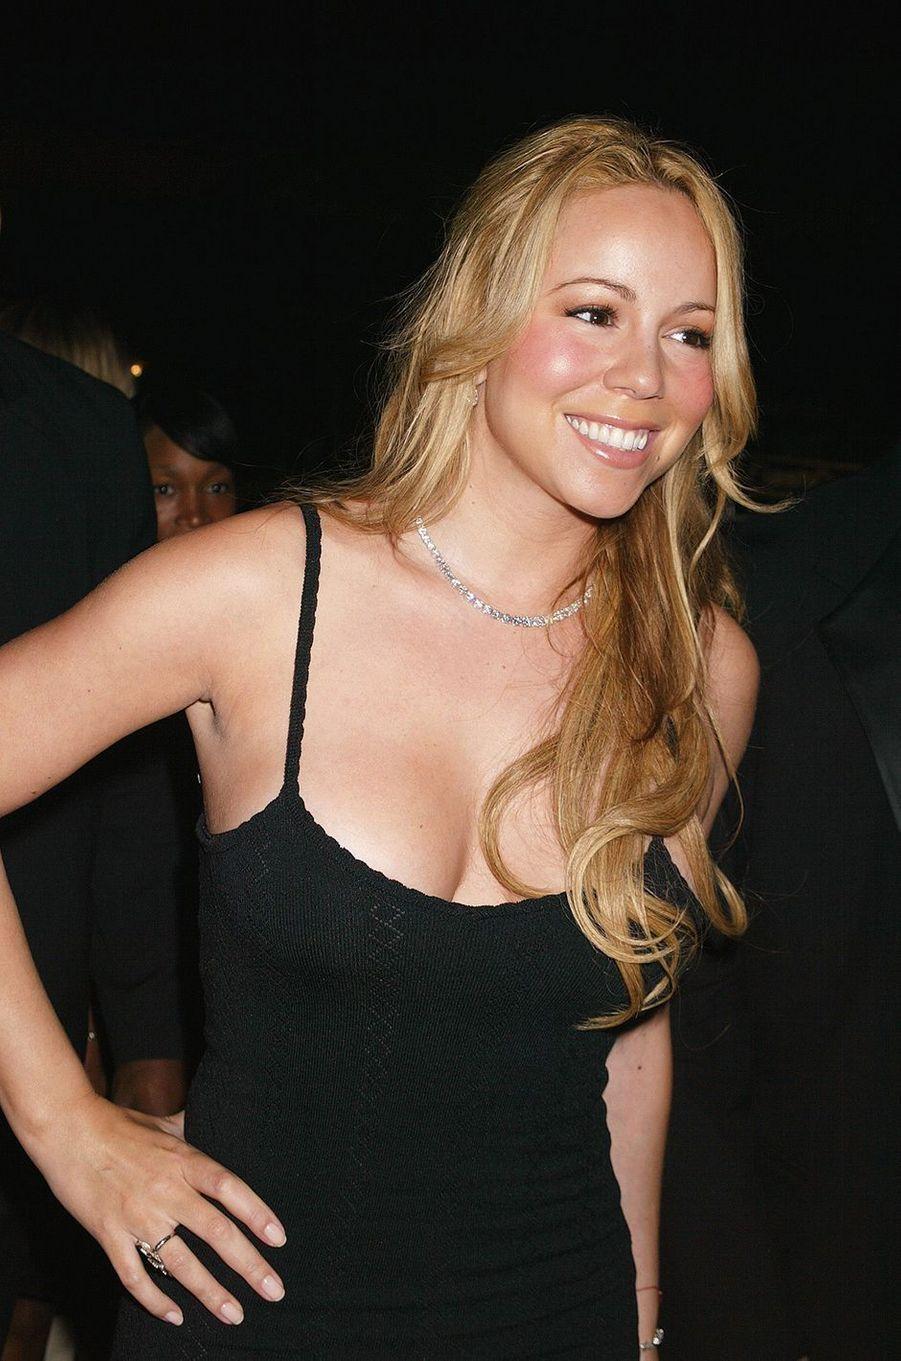 Mariah Carey lors d'un soirée à New York en mai 2004